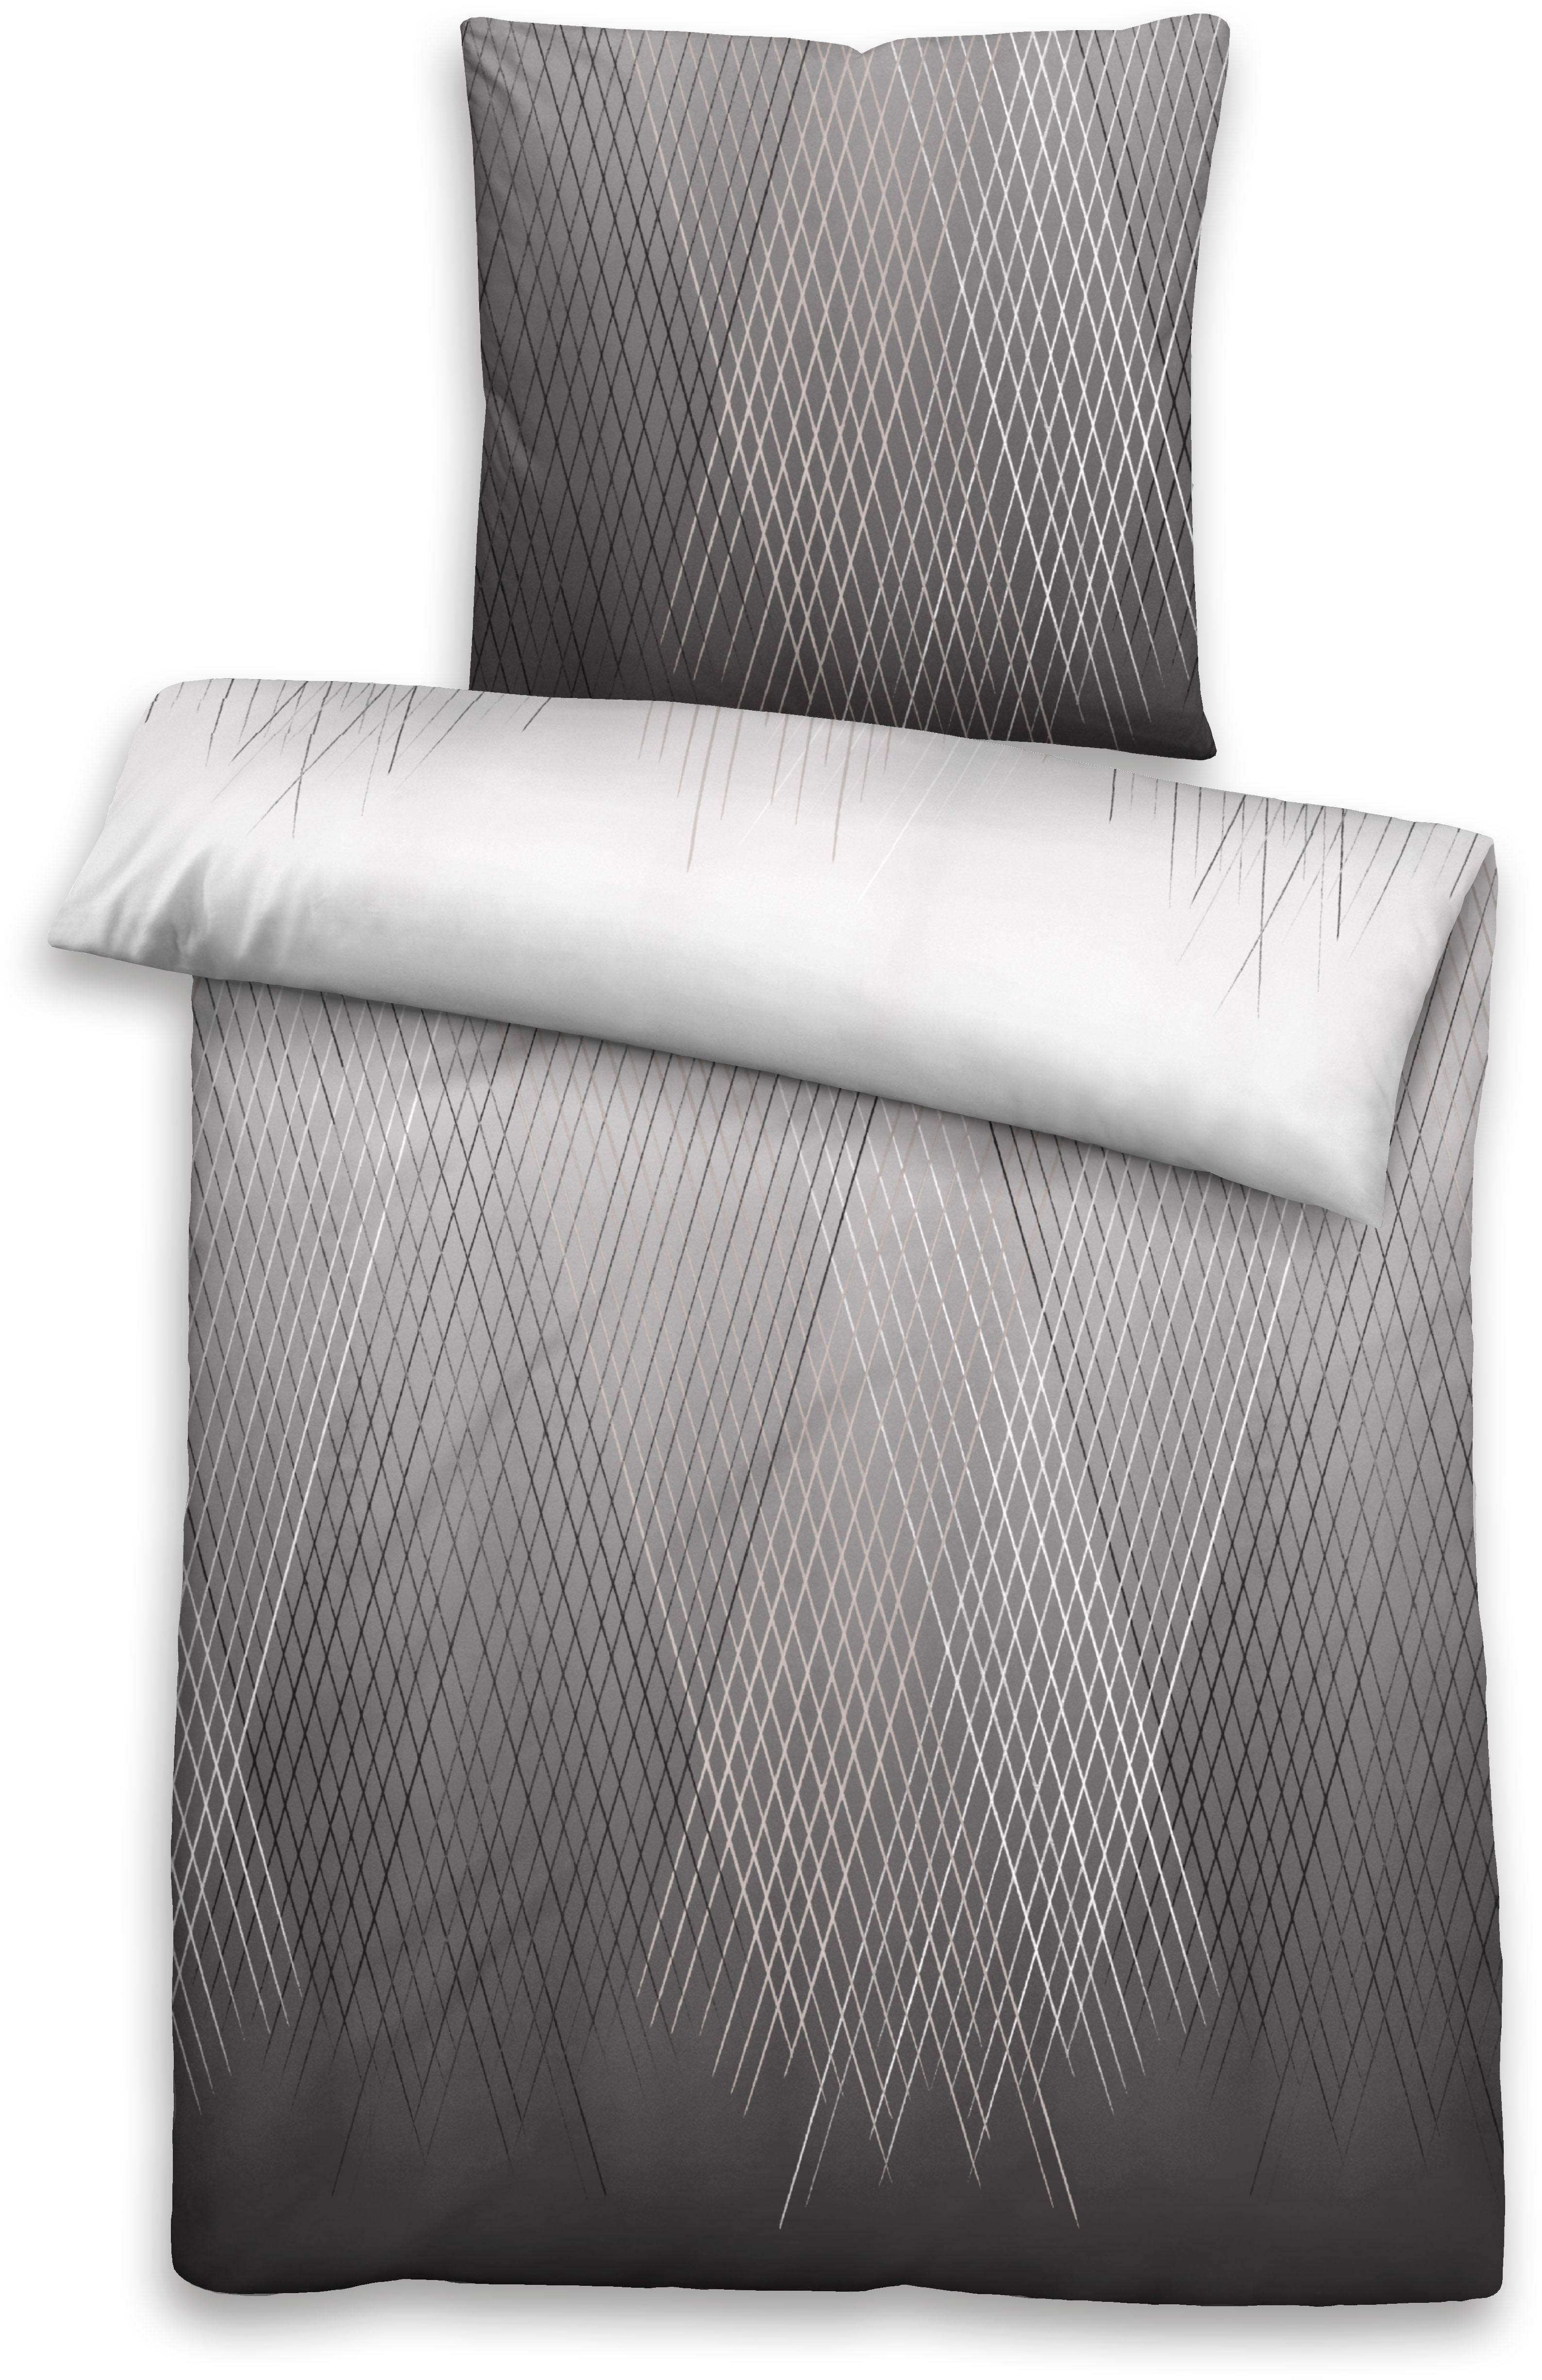 Castell Microfaser Satin Bettwäsche Set 2-tlg Bettbezug Ciel 155 x 200 80 x 80